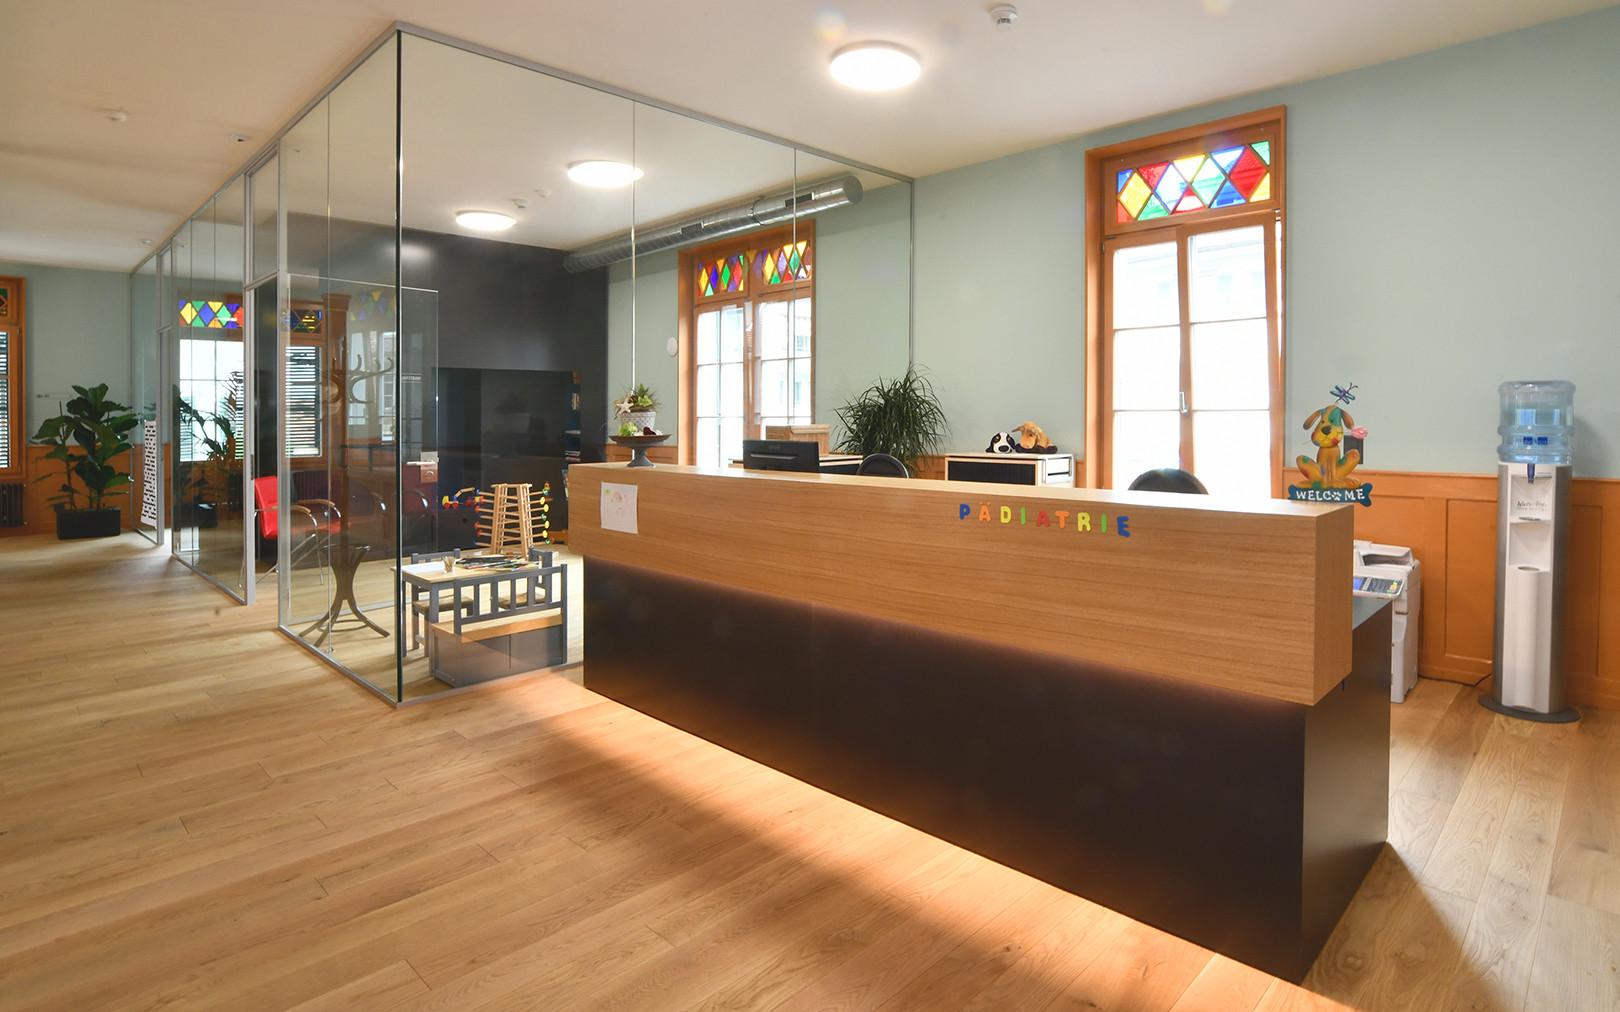 Pädiatrie_MZLandhaus_Steffisburg1.jpg